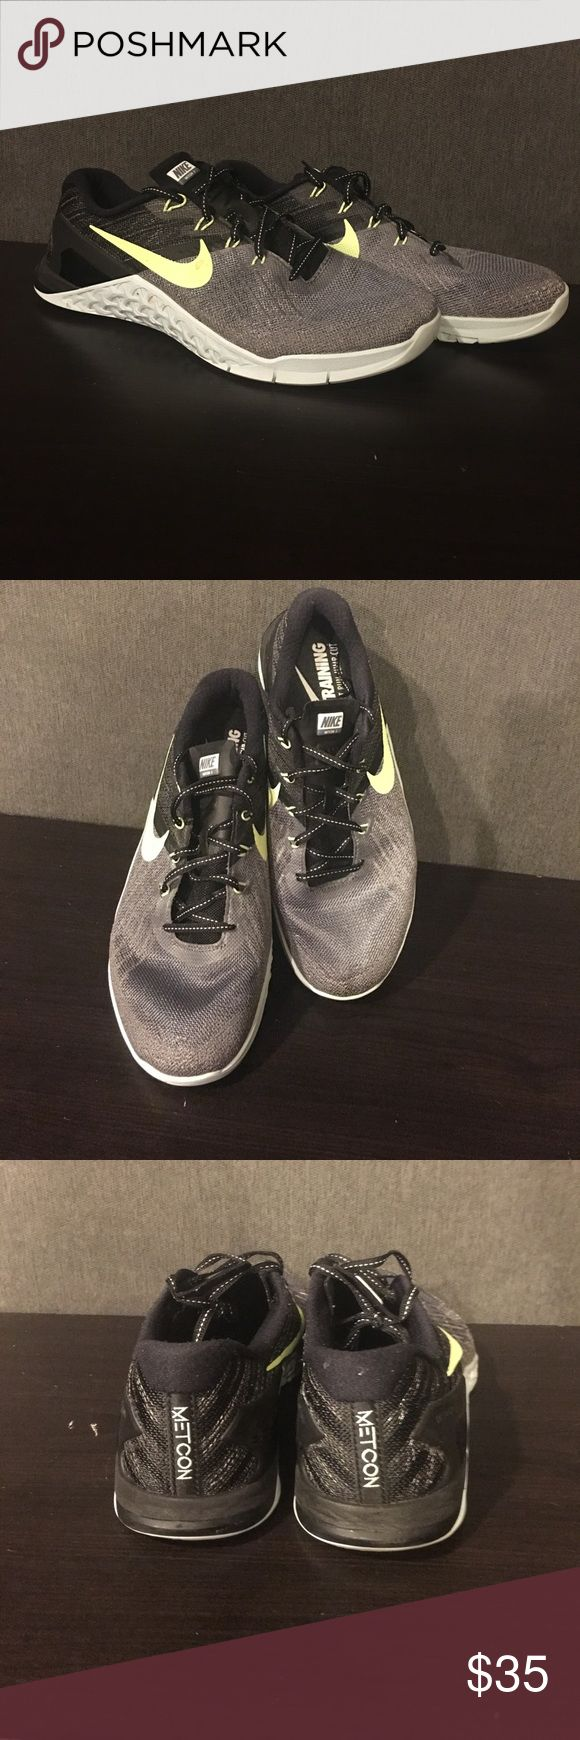 Nike training shoes Nike metcon 3 training shoes. Women's Nike Shoes Athletic Shoes